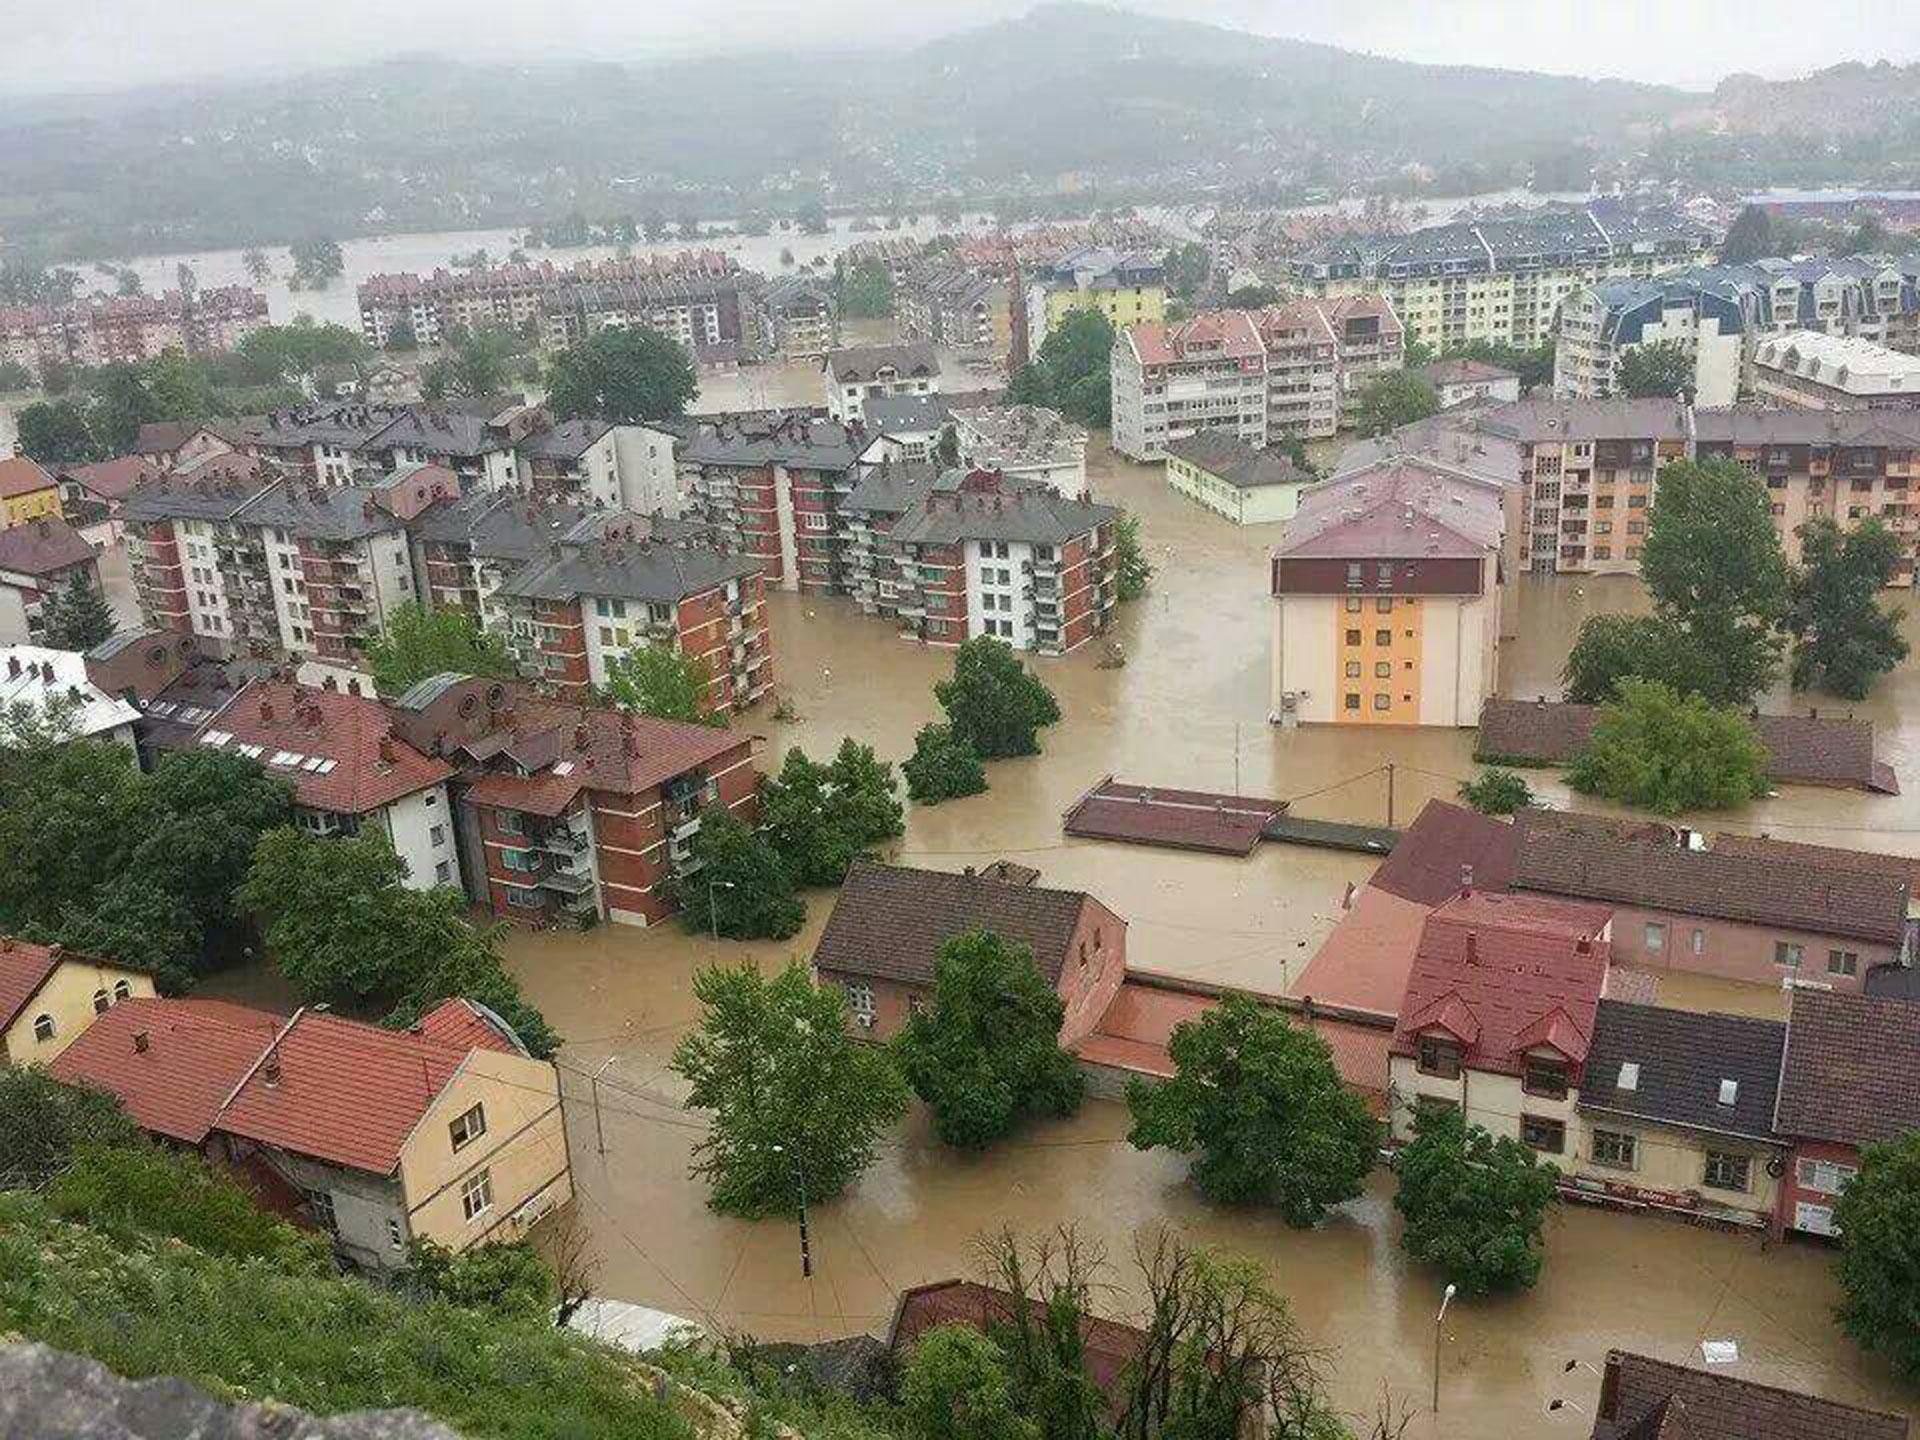 upozorenje-poplave-nose-potencijalnu-opasnost-sirenja-zarazni-bolesti_1400160211